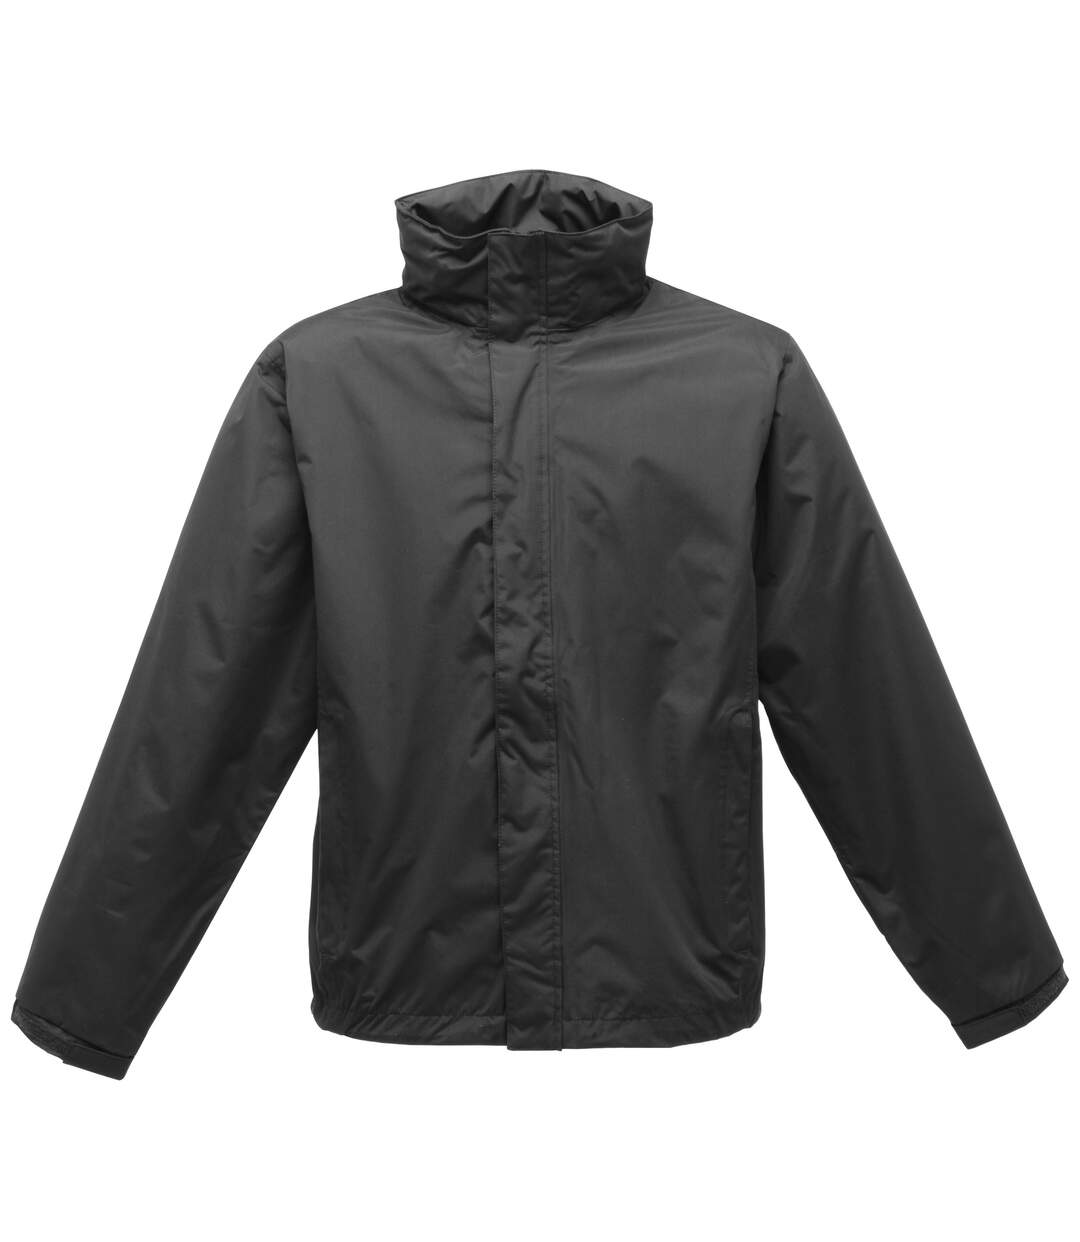 Regatta Mens Pace II Lightweight Waterproof Jacket (Black/Black) - UTBC1495